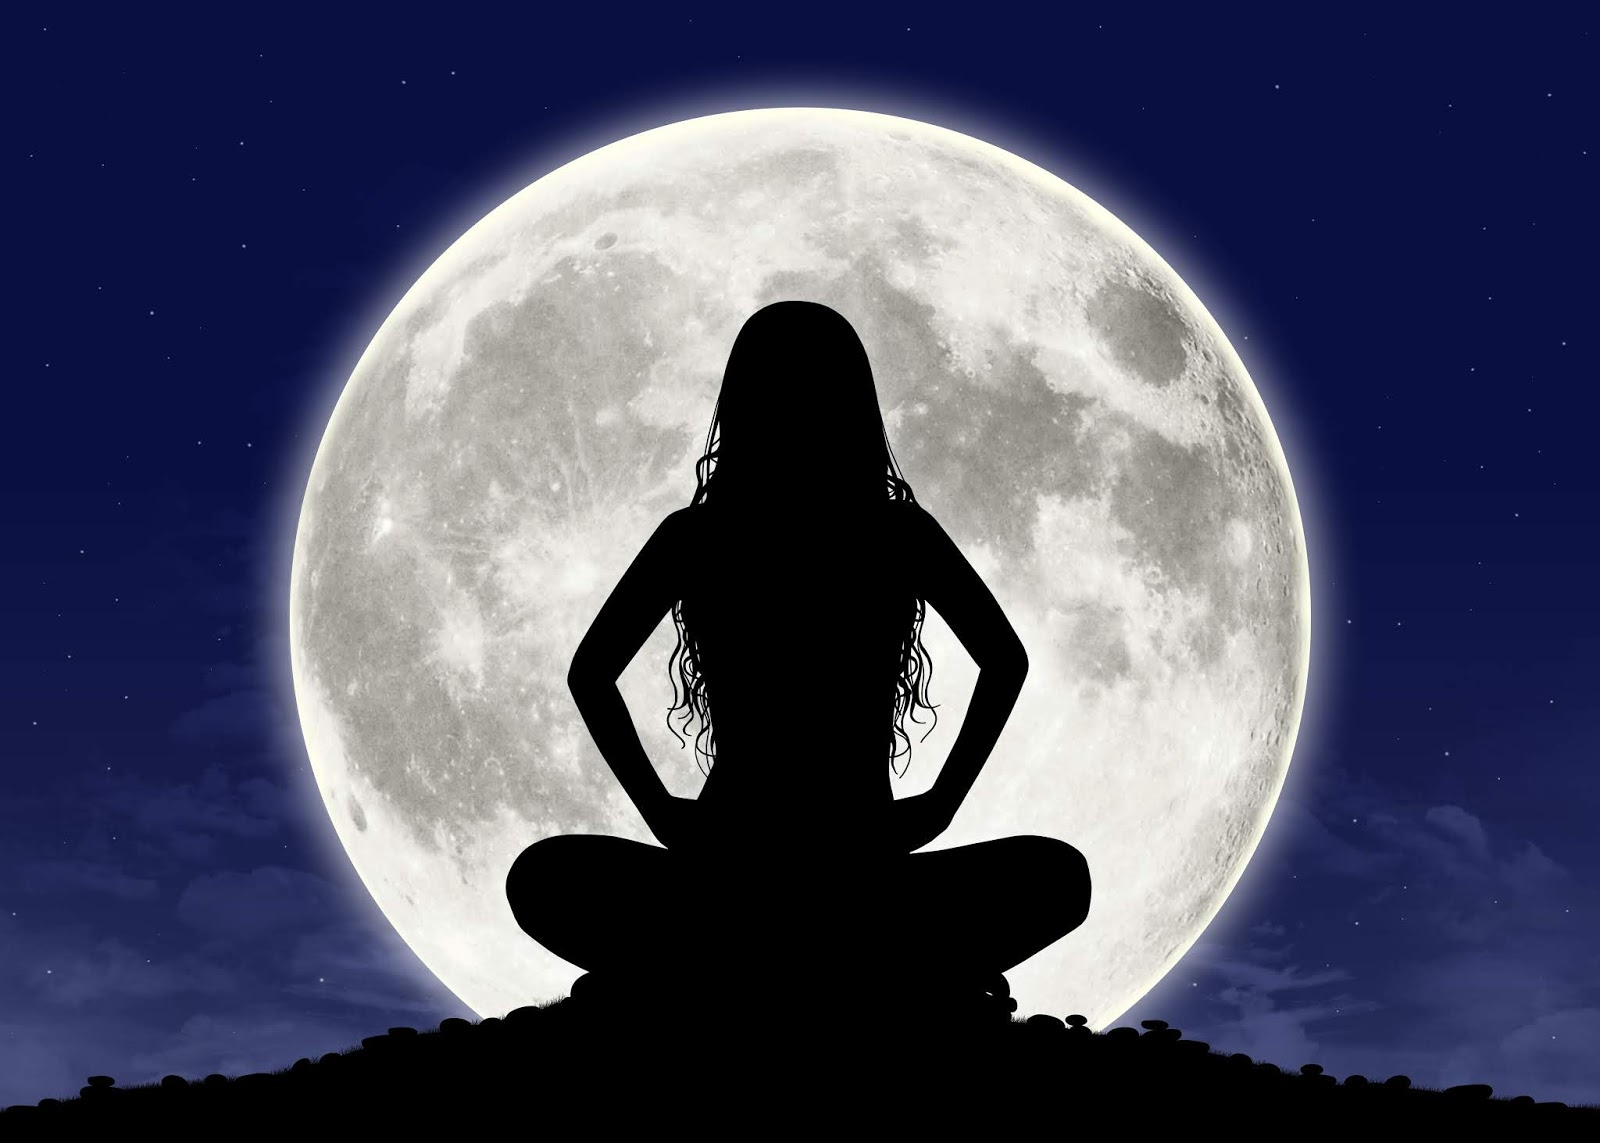 Full Moon Meditation & New Moon Peace Meditation for 2019